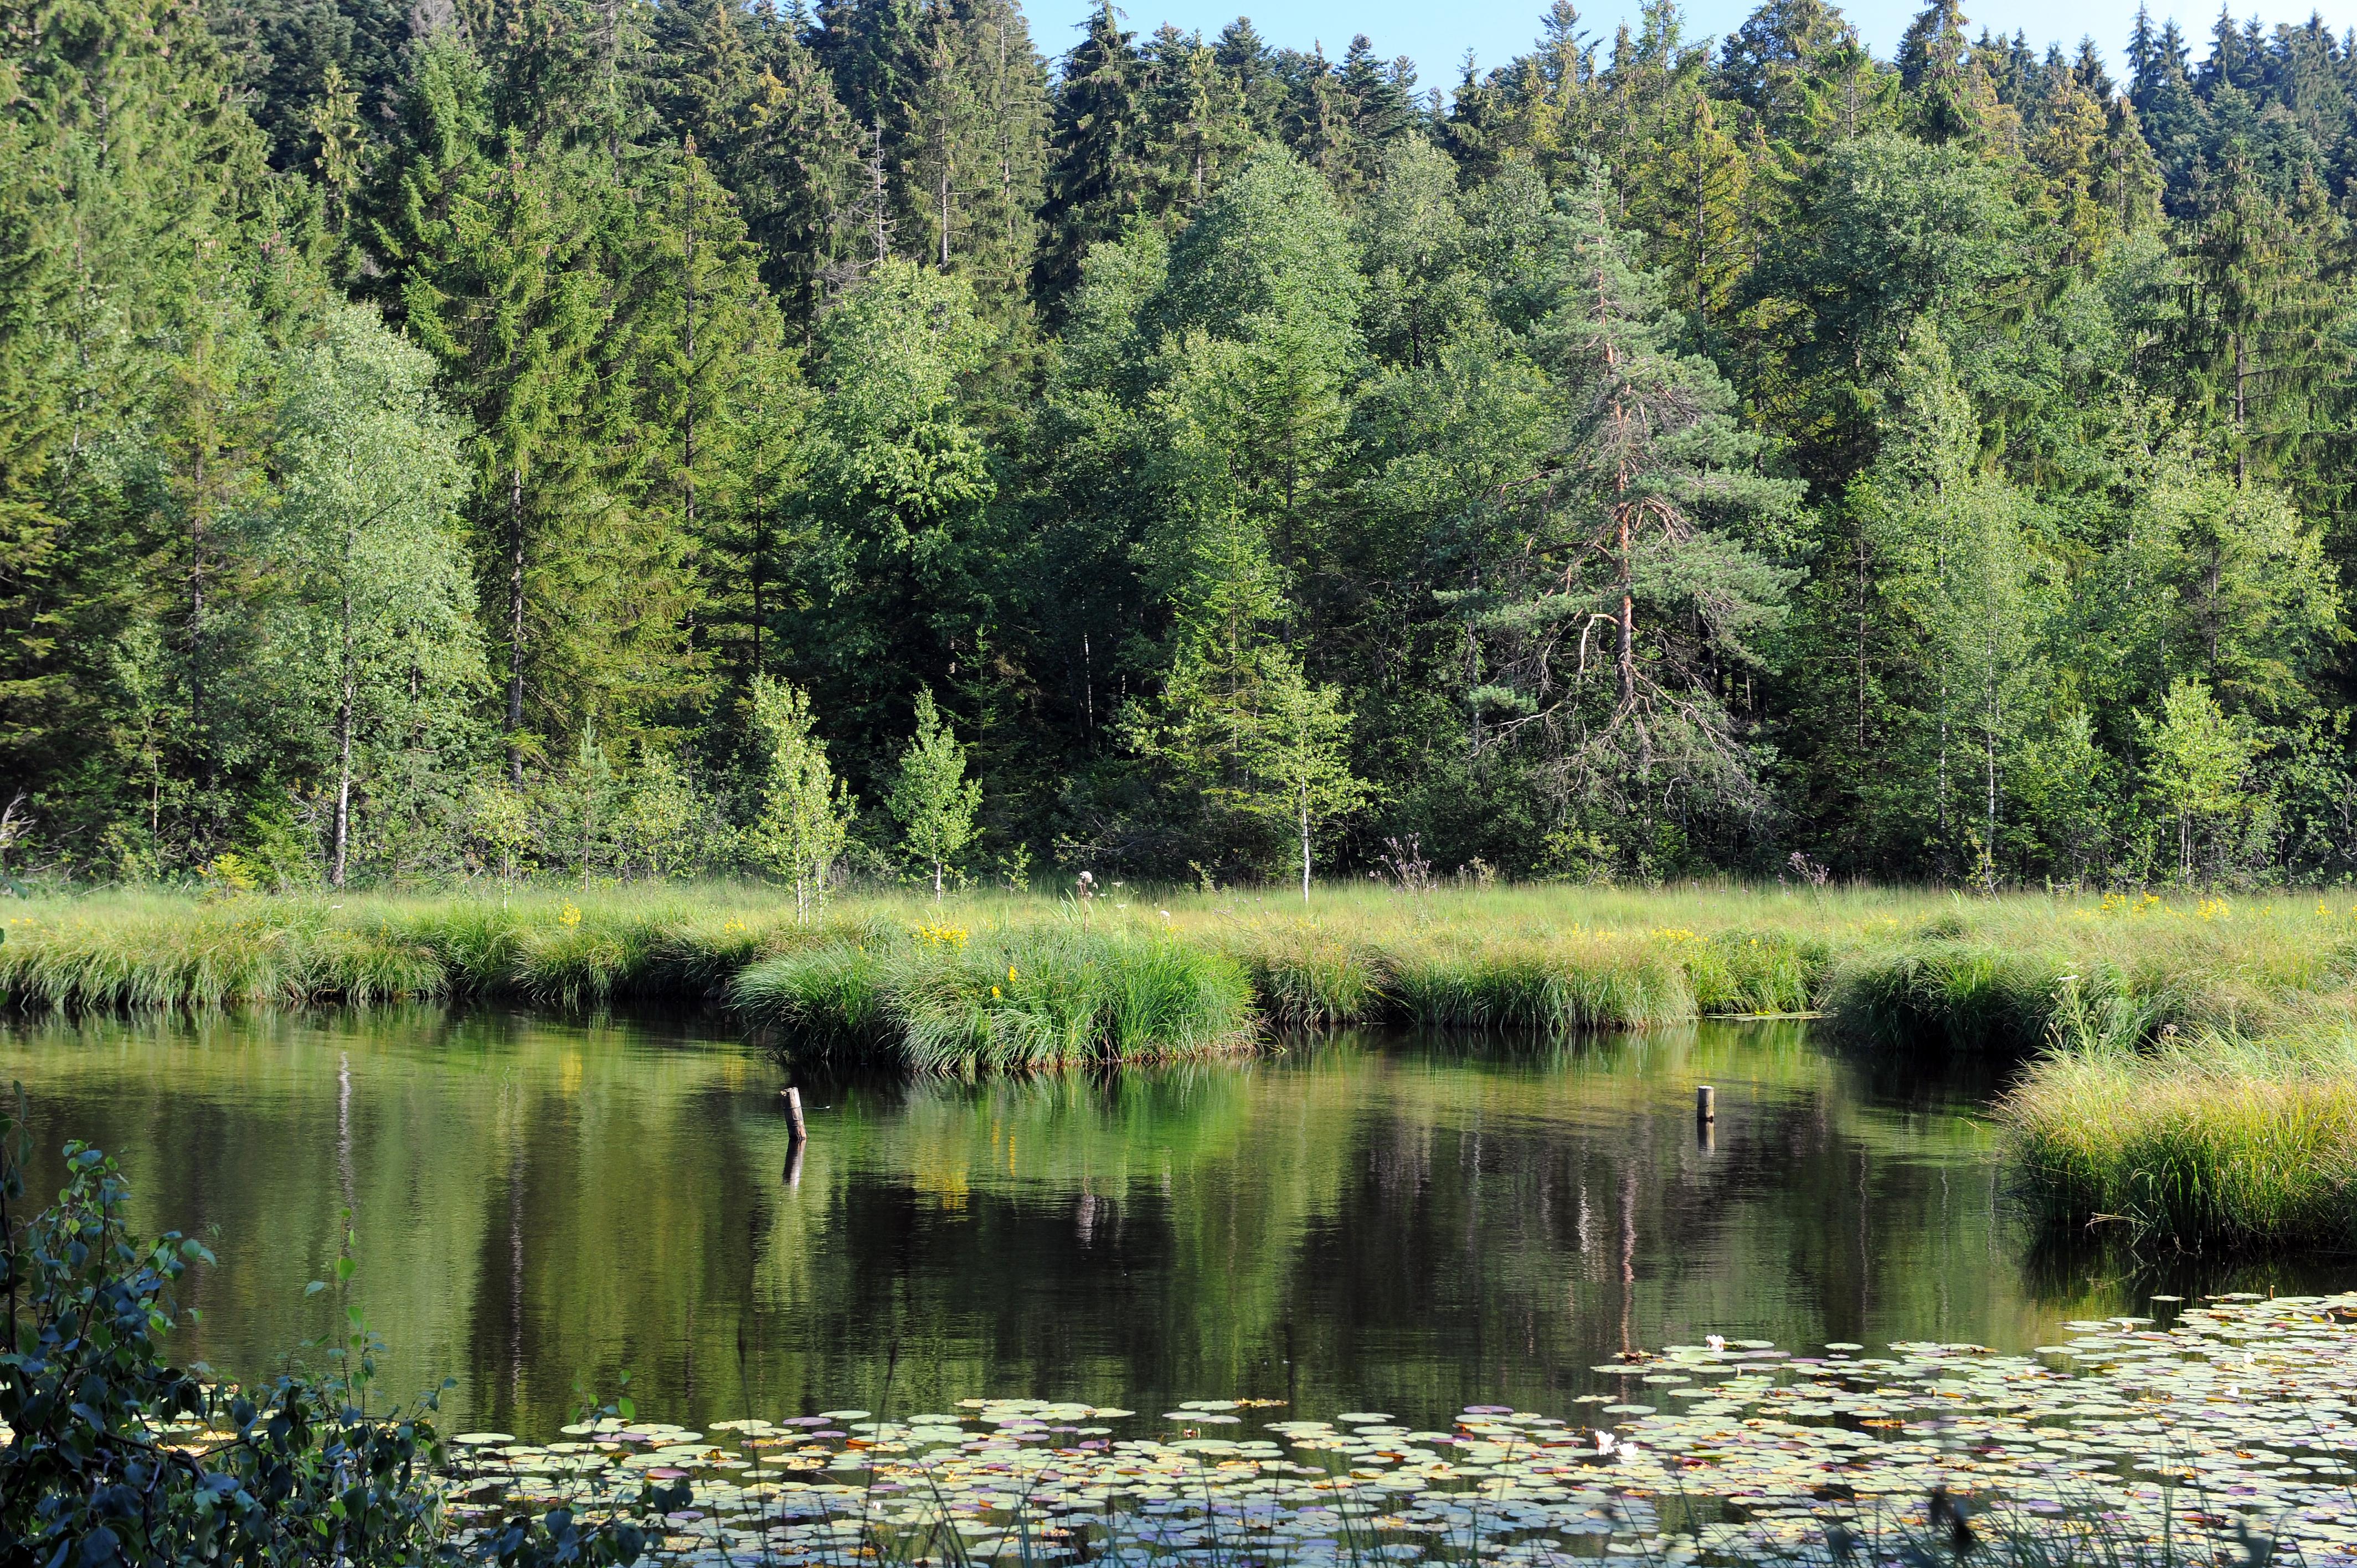 waldsee_seerosen-thomasgretler